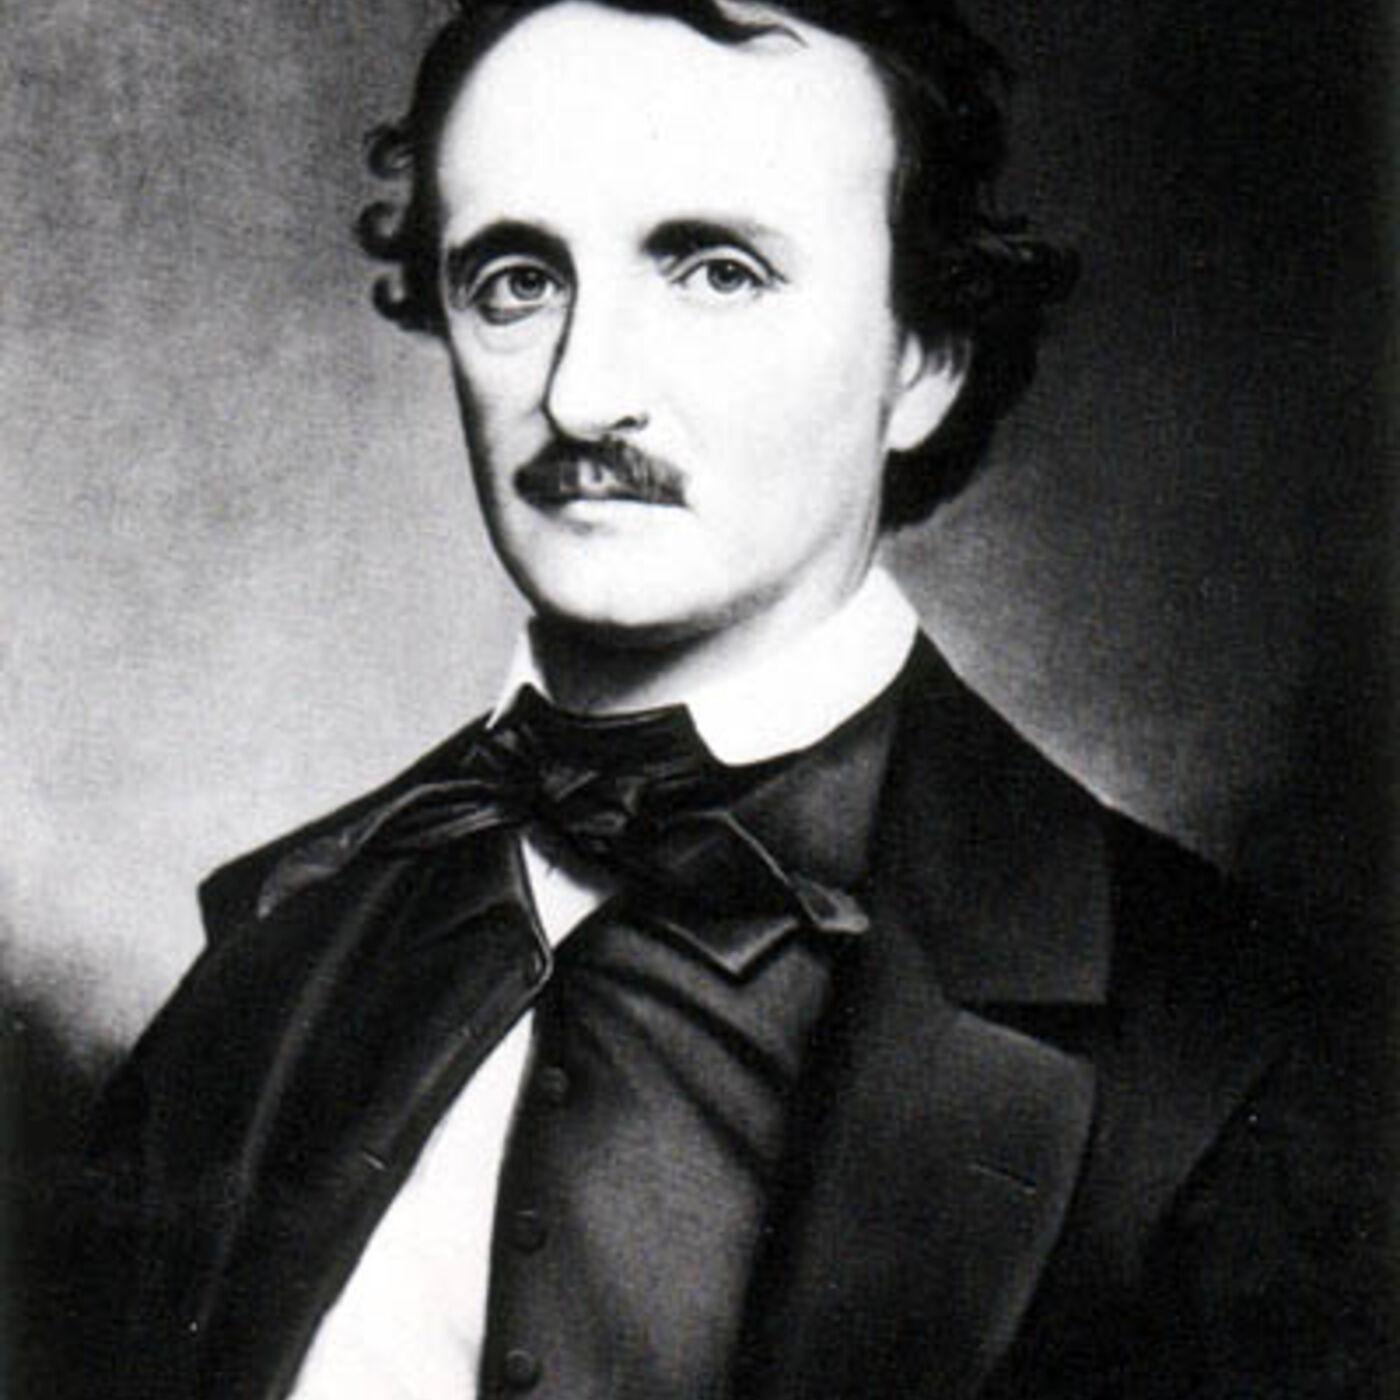 Edgar Allan Poe Romance The City in the Sea The Conqueror Worm